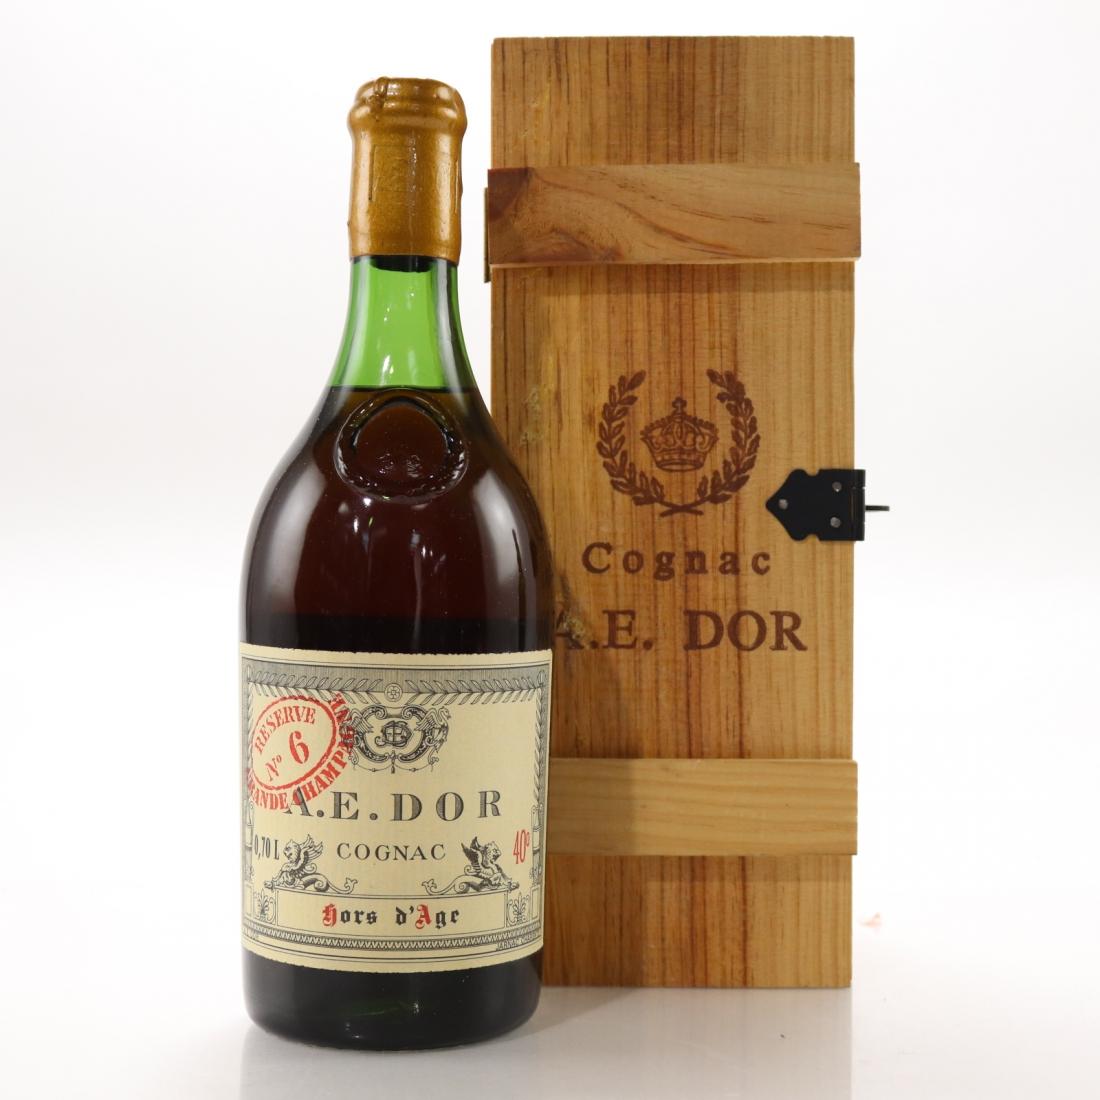 A.E. DOR Grande Champagne Cognac Reserve No.6